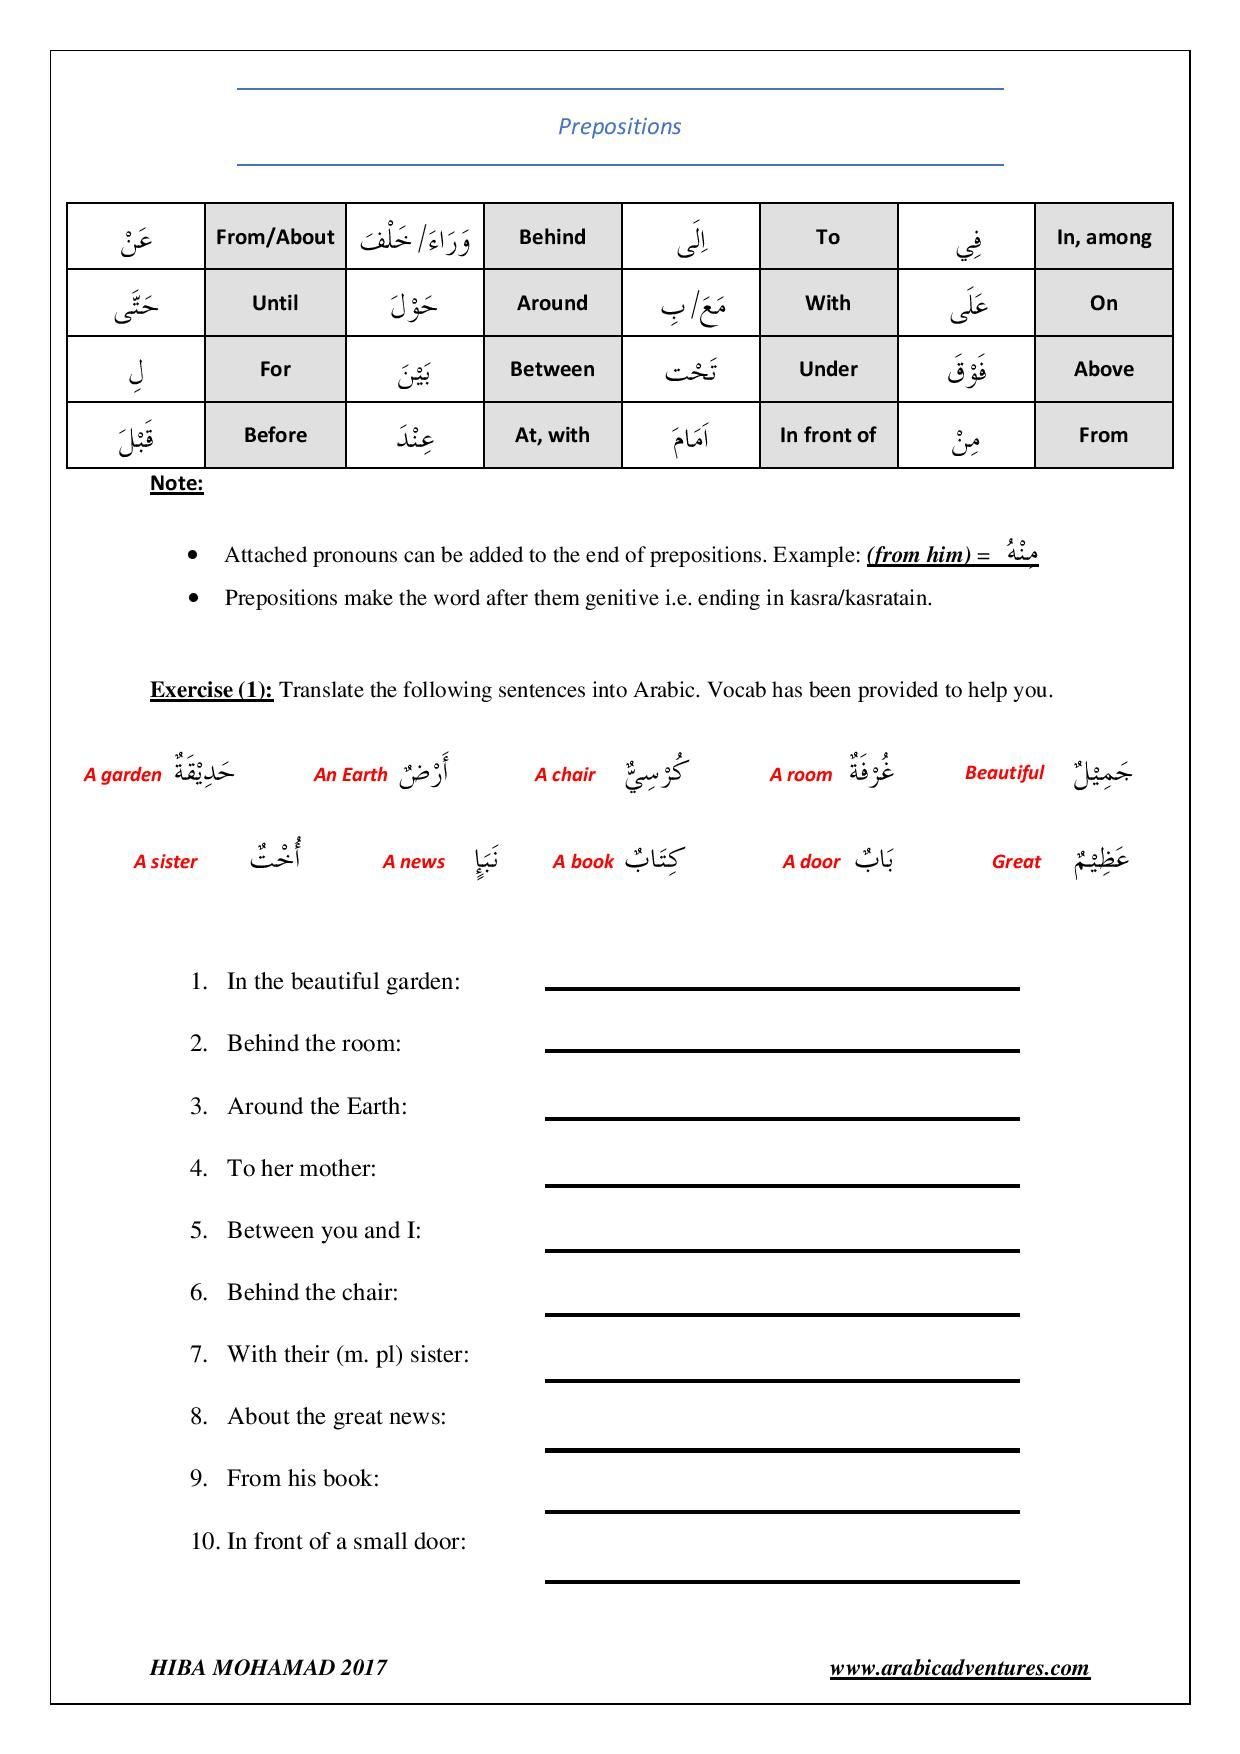 hight resolution of Prepositions worksheet www.arabicadventures.com   Grammar worksheets